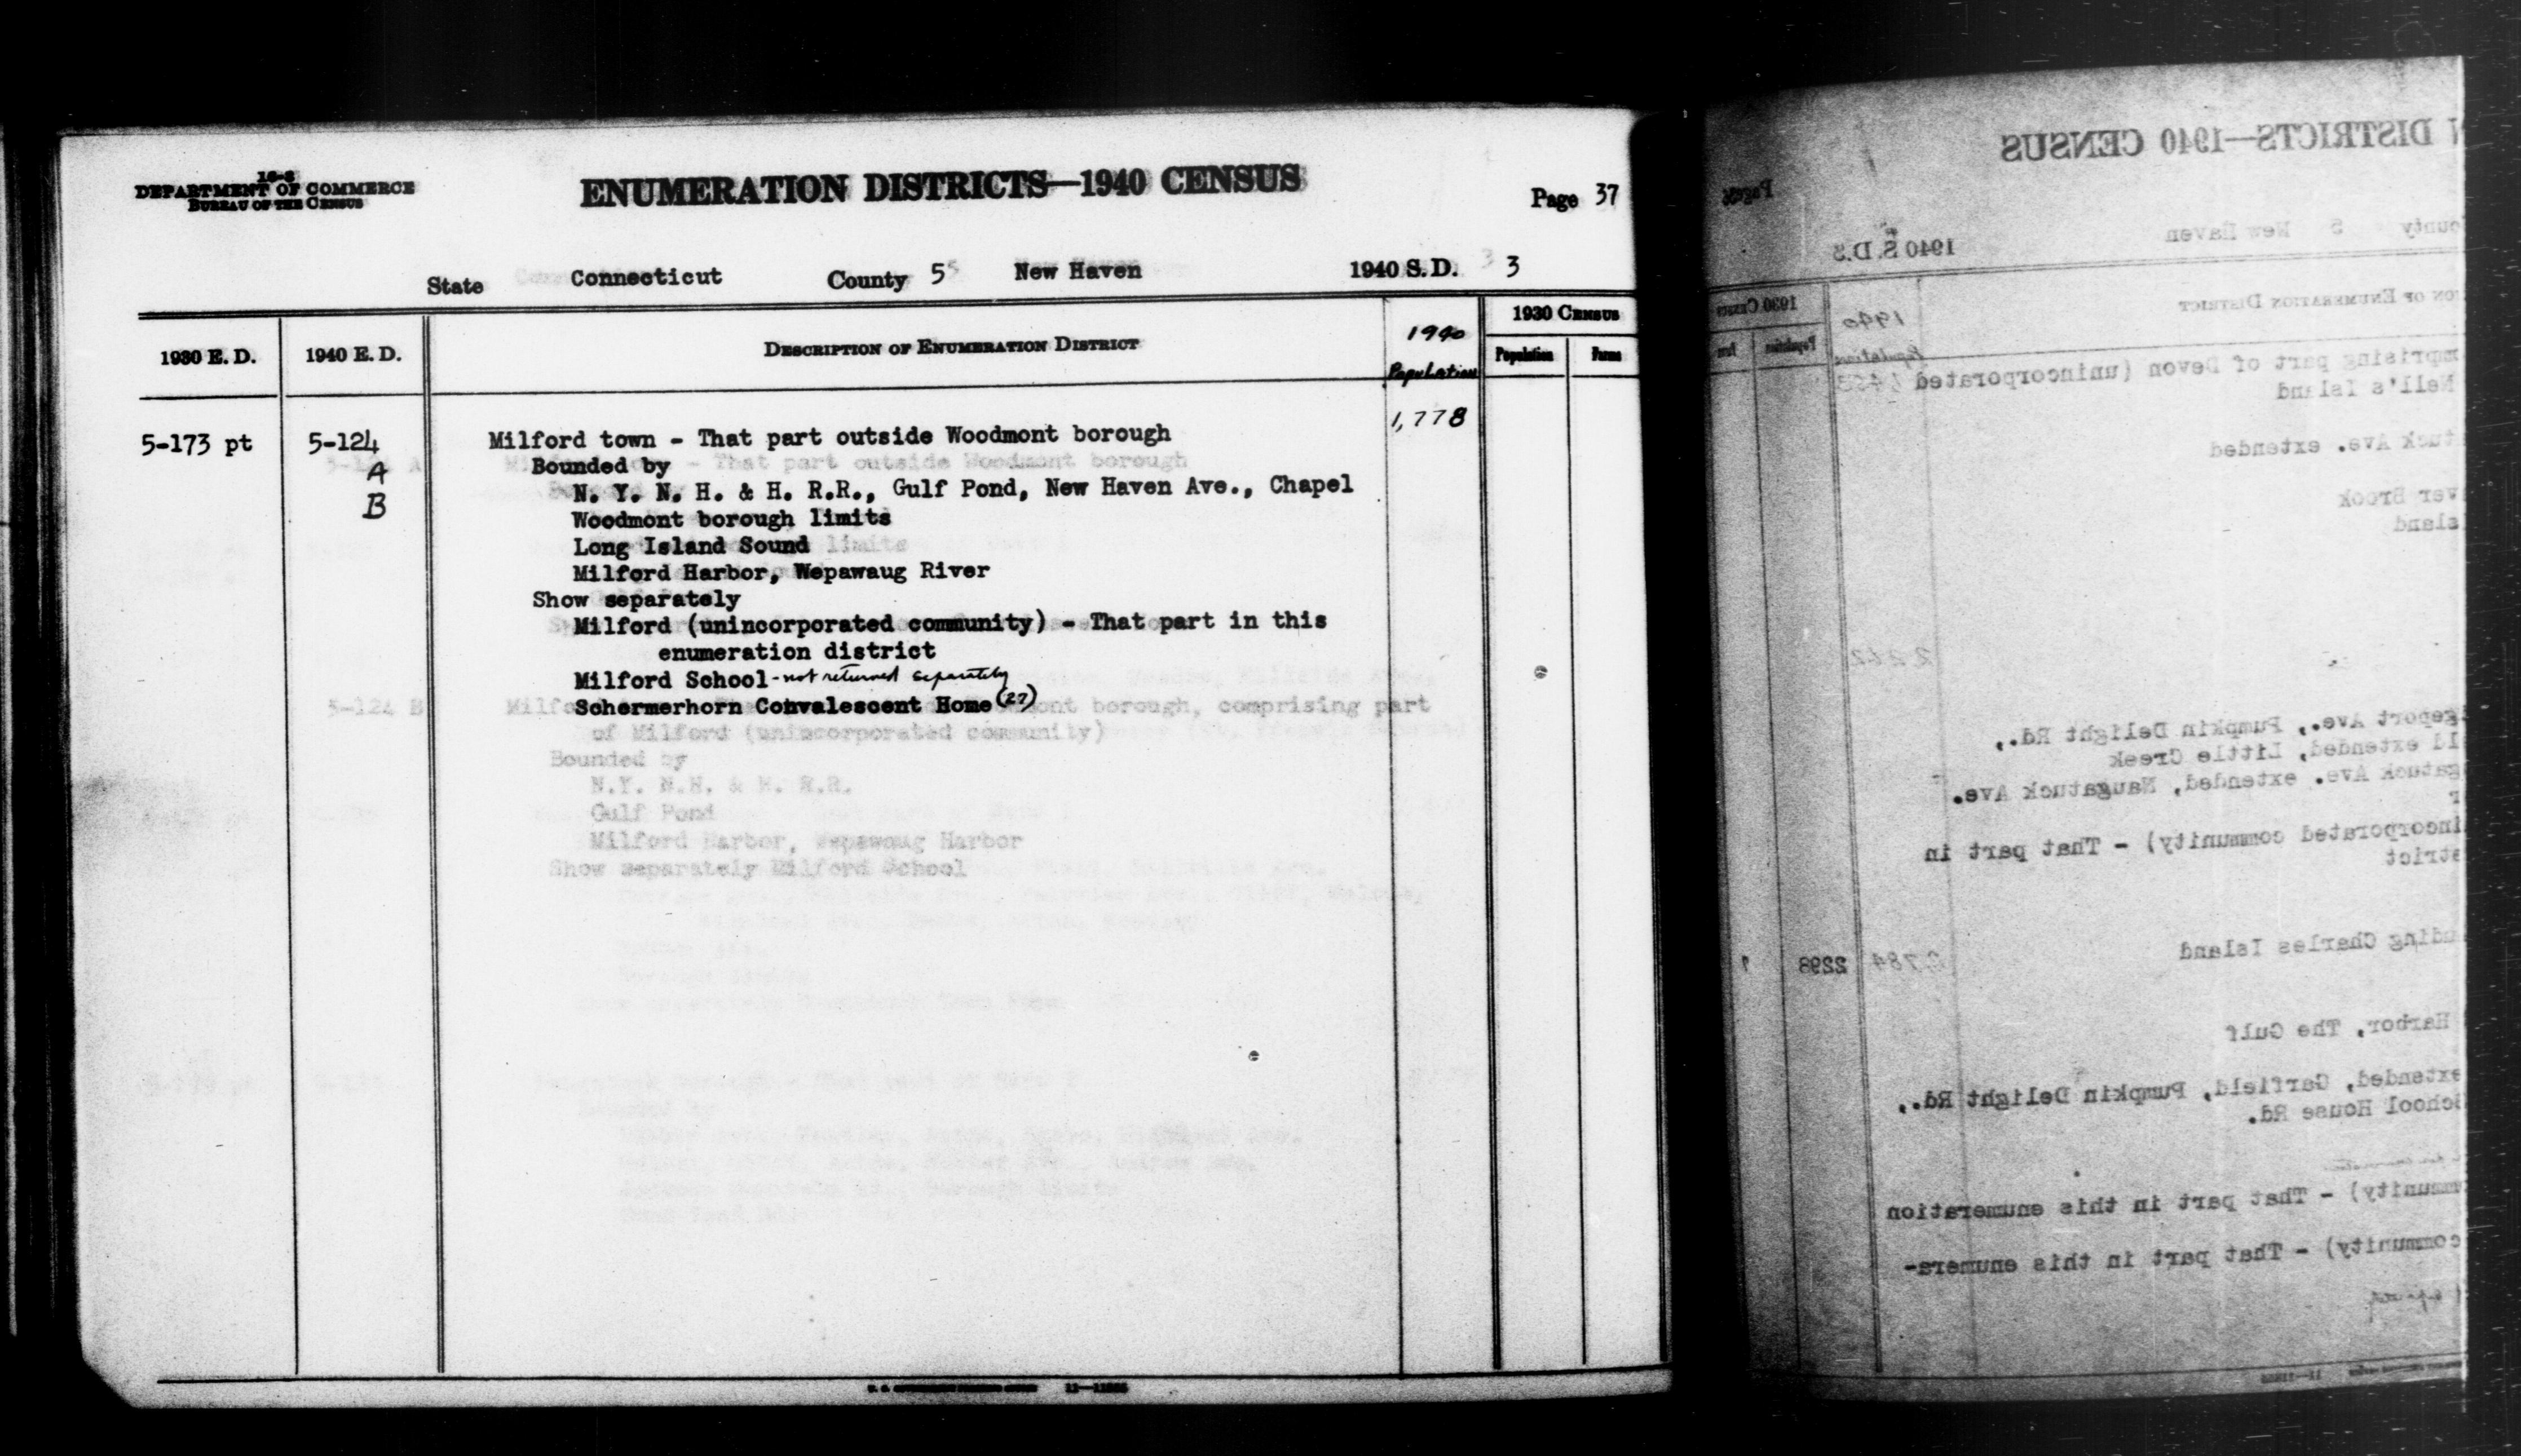 1940 Census Enumeration District Descriptions - Connecticut - New Haven County - ED 5-124A, ED 5-124B